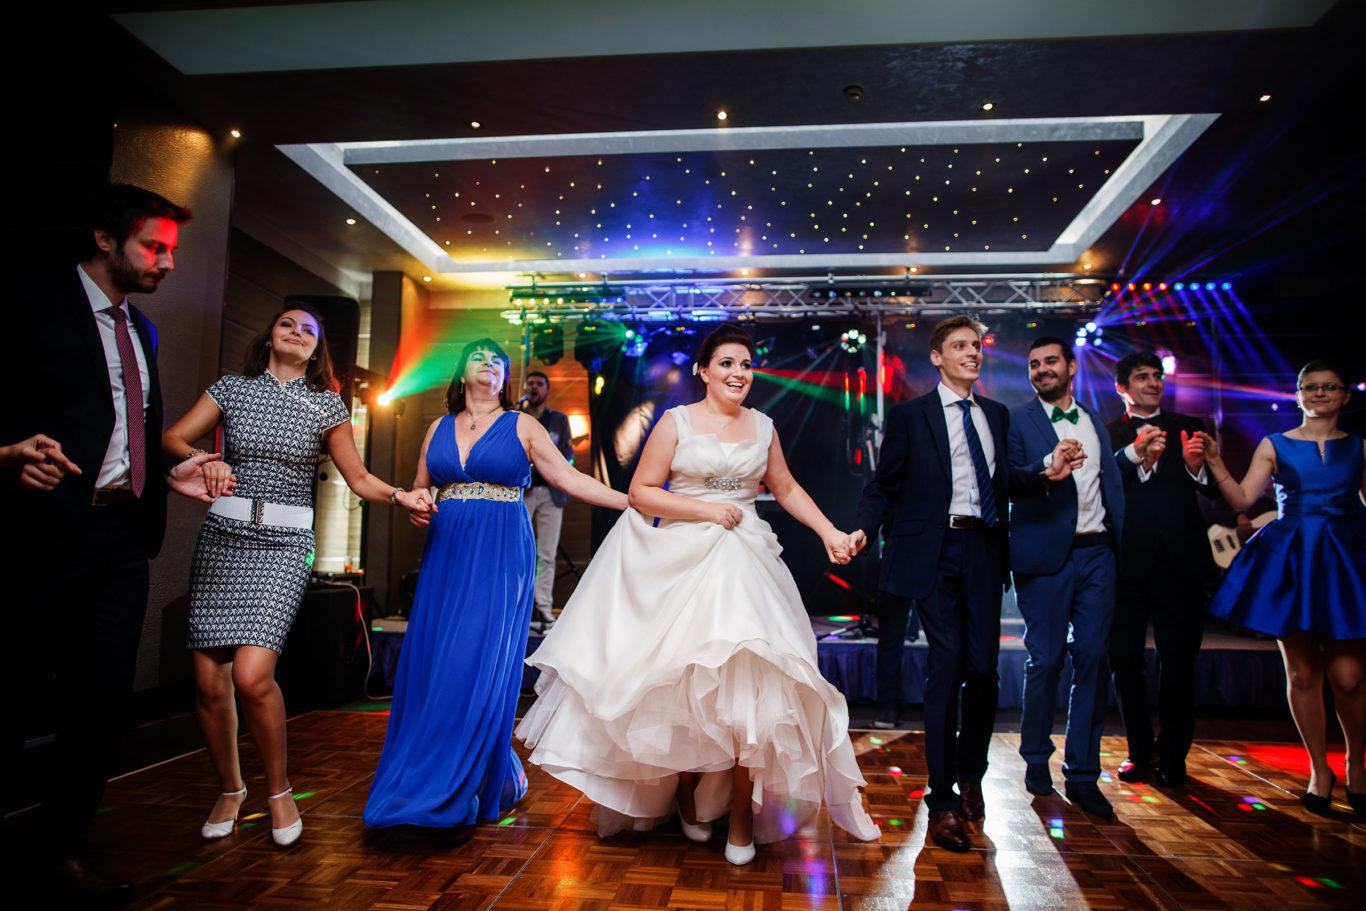 0506-Fotografie-nunta-Roxana-Costin-fotograf-Ciprian-Dumitrescu-DC1X1196